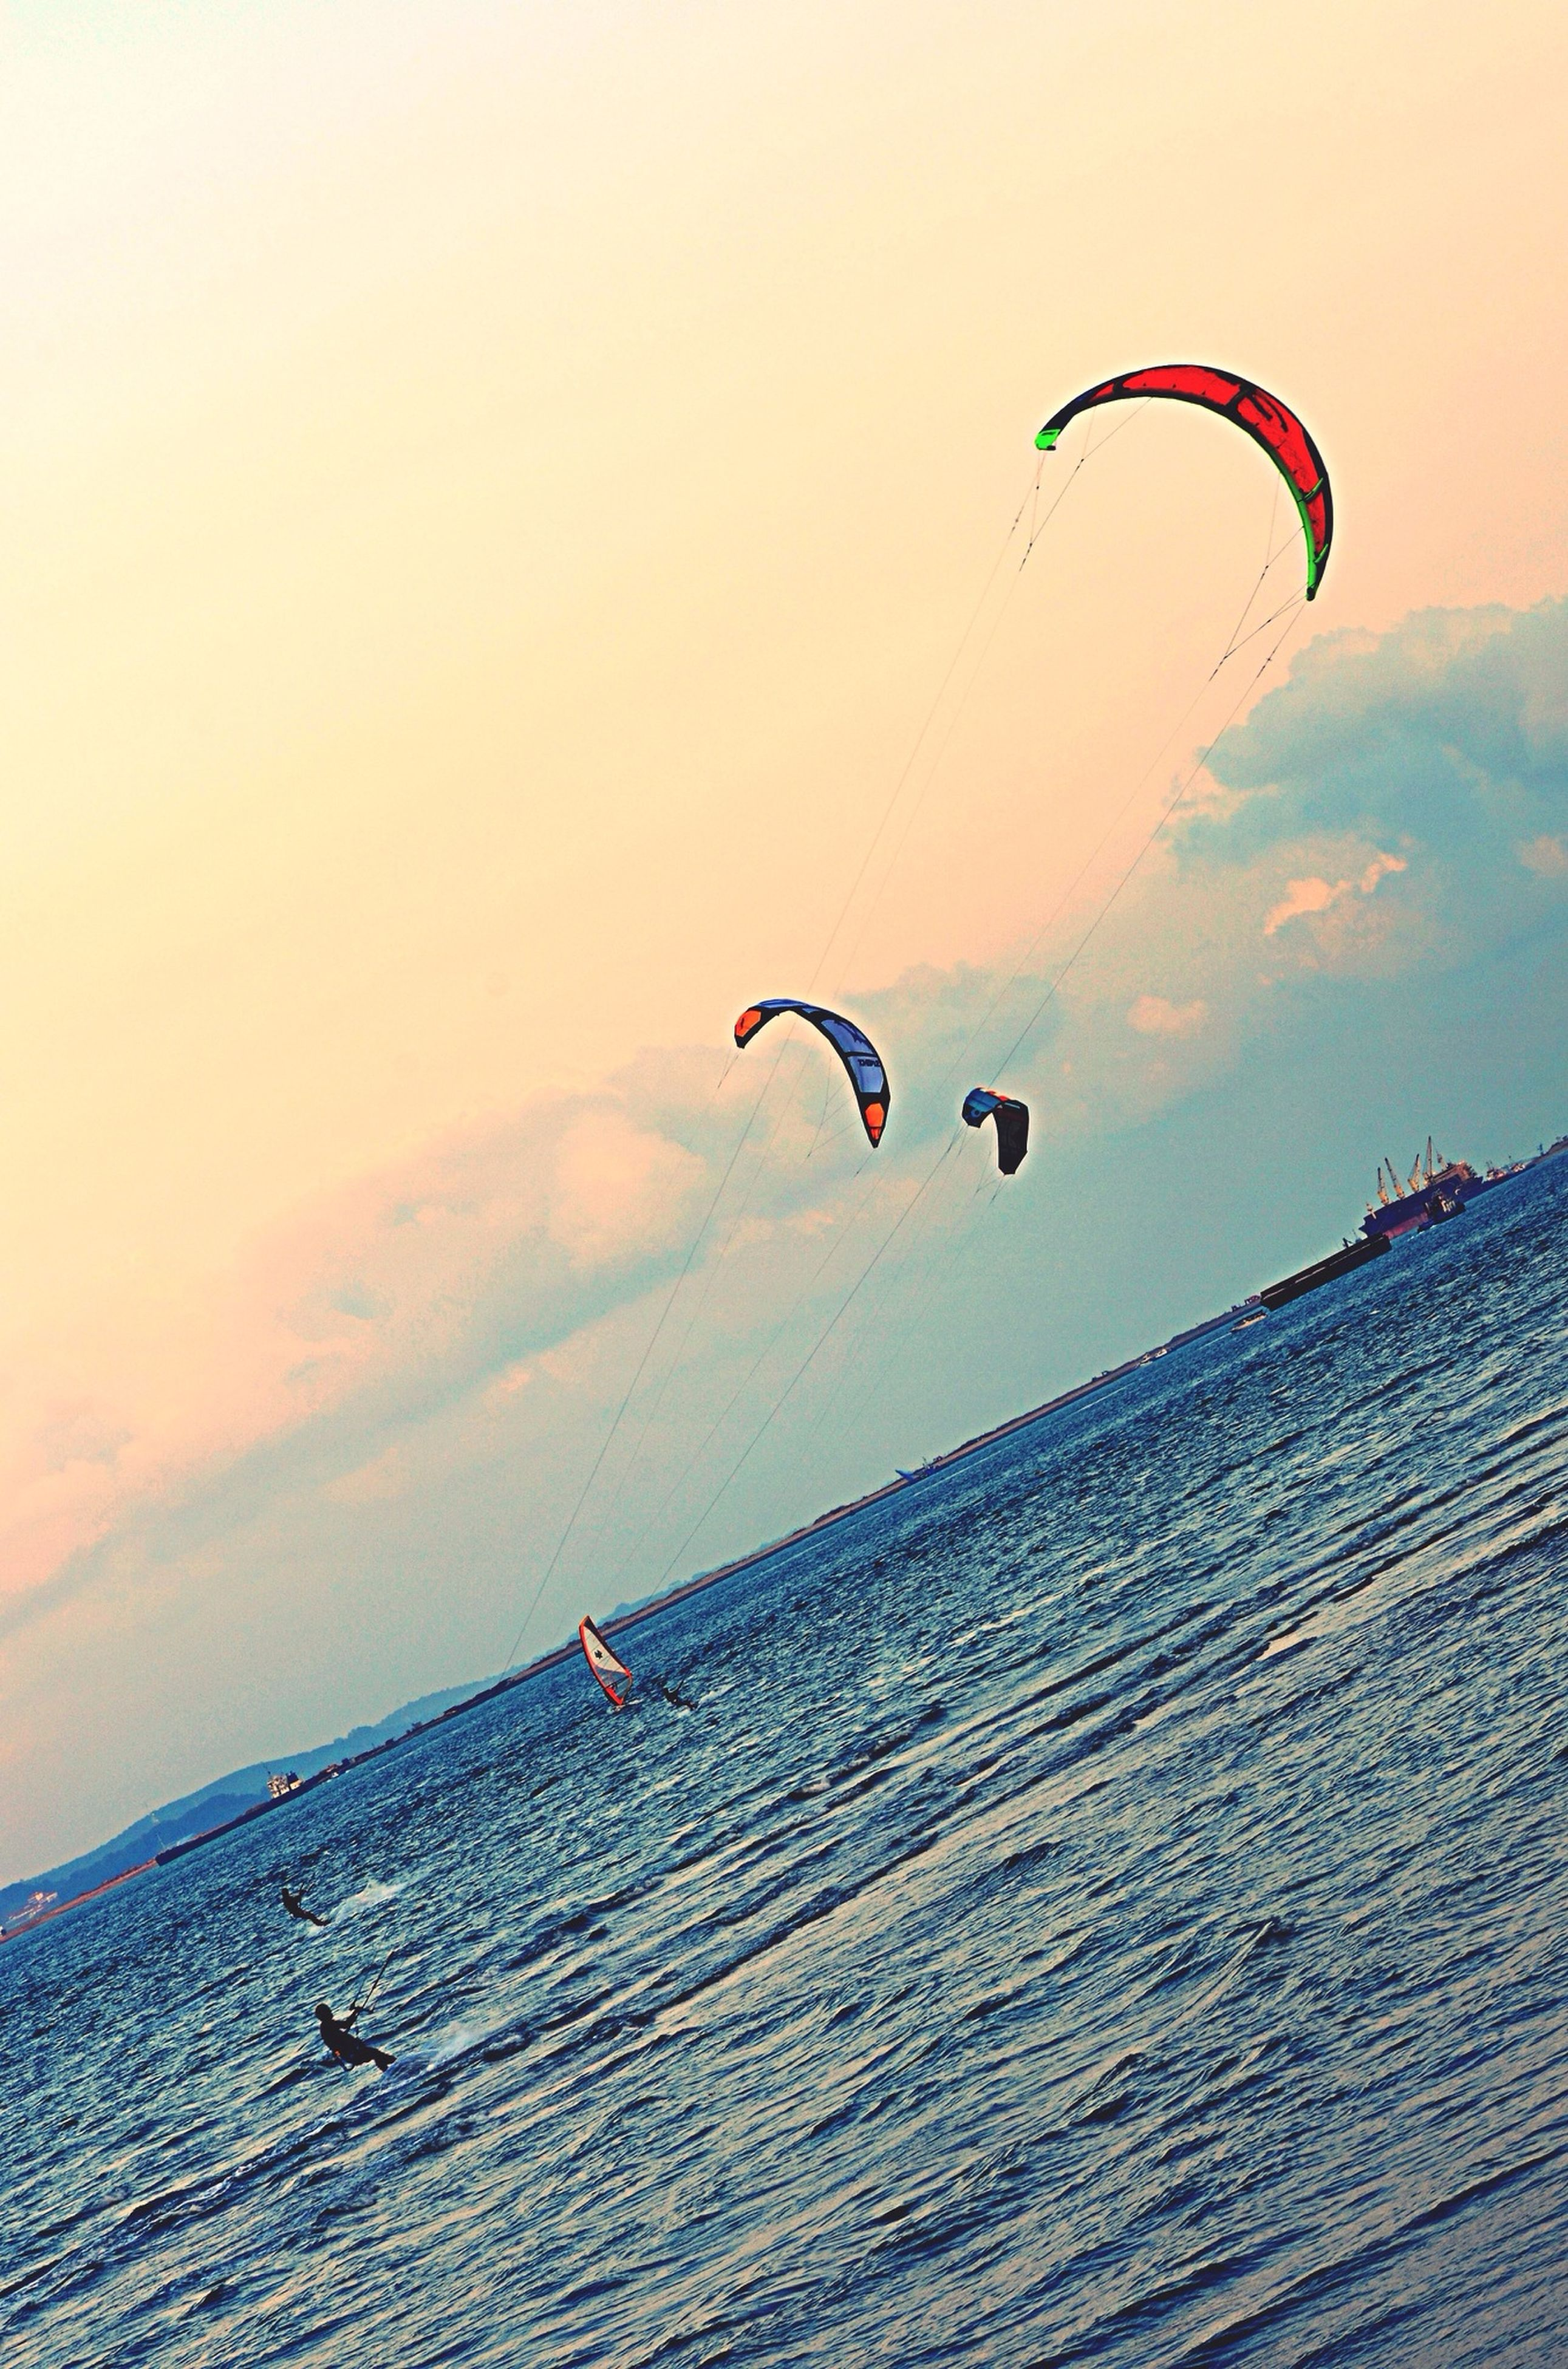 mid-air, extreme sports, leisure activity, parachute, adventure, sport, lifestyles, flying, paragliding, exhilaration, transportation, unrecognizable person, fun, skill, sky, men, hot air balloon, enjoyment